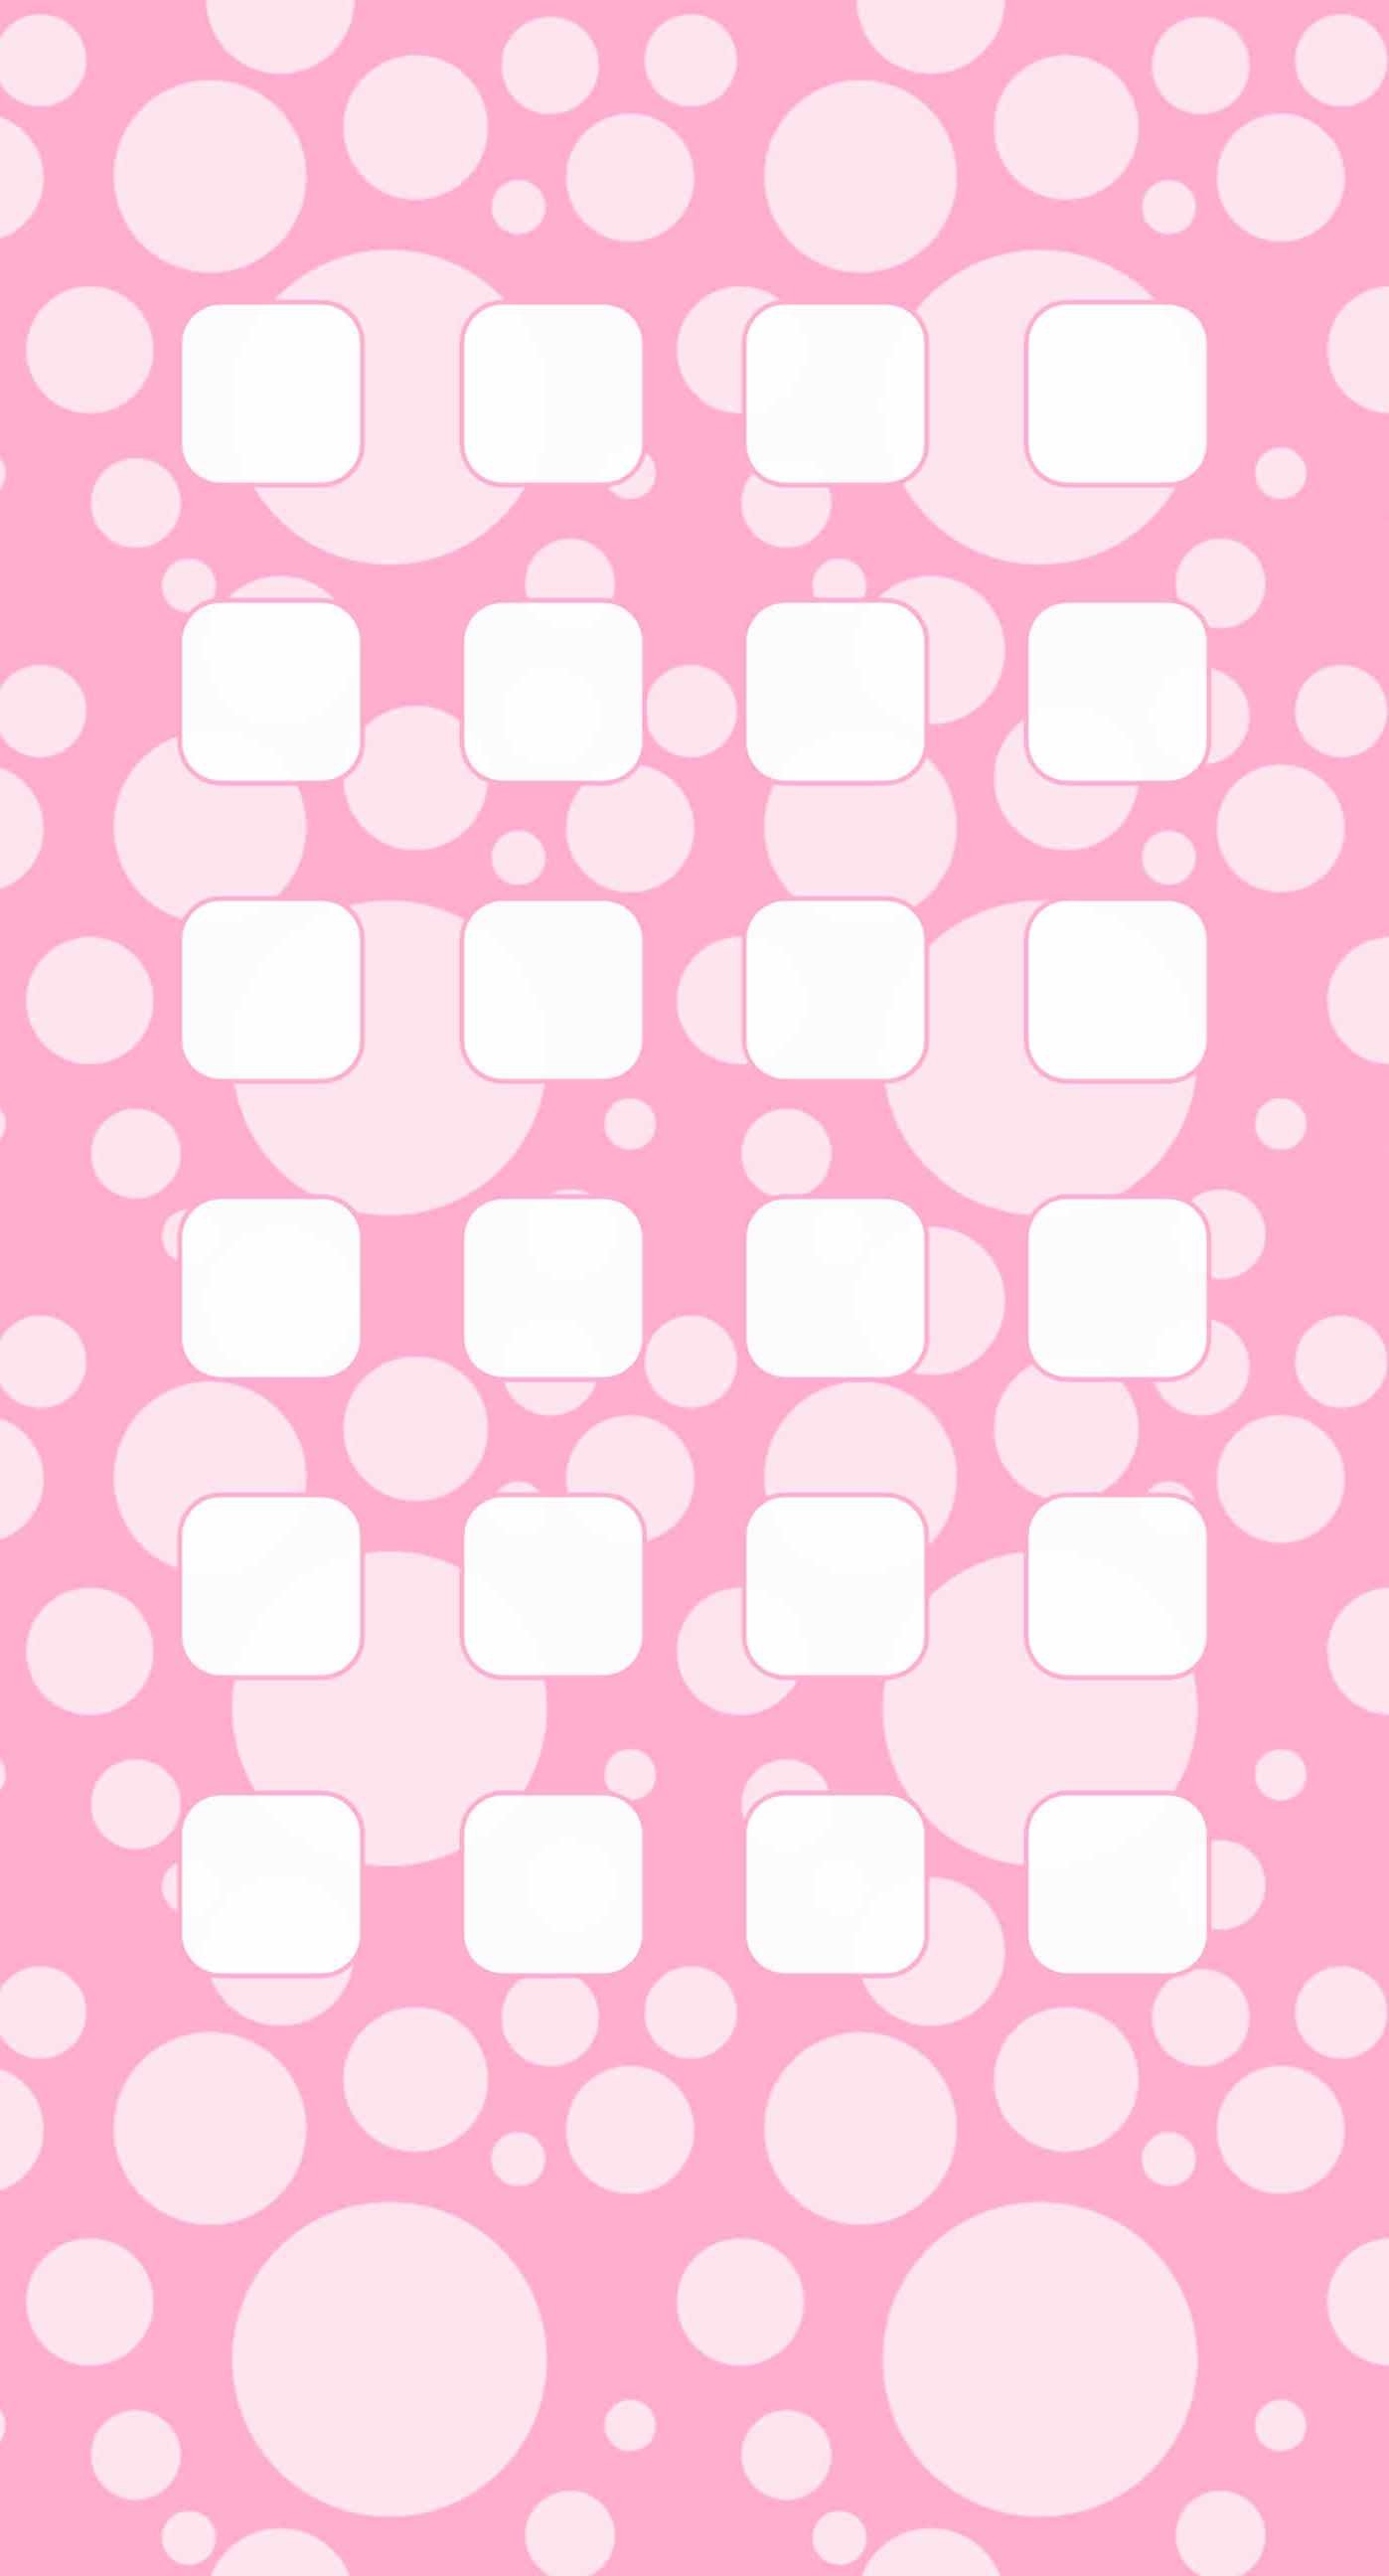 Polka dot pattern for girls pink shelf iPhone6s Plus / iPhone6 Plus  Wallpaper